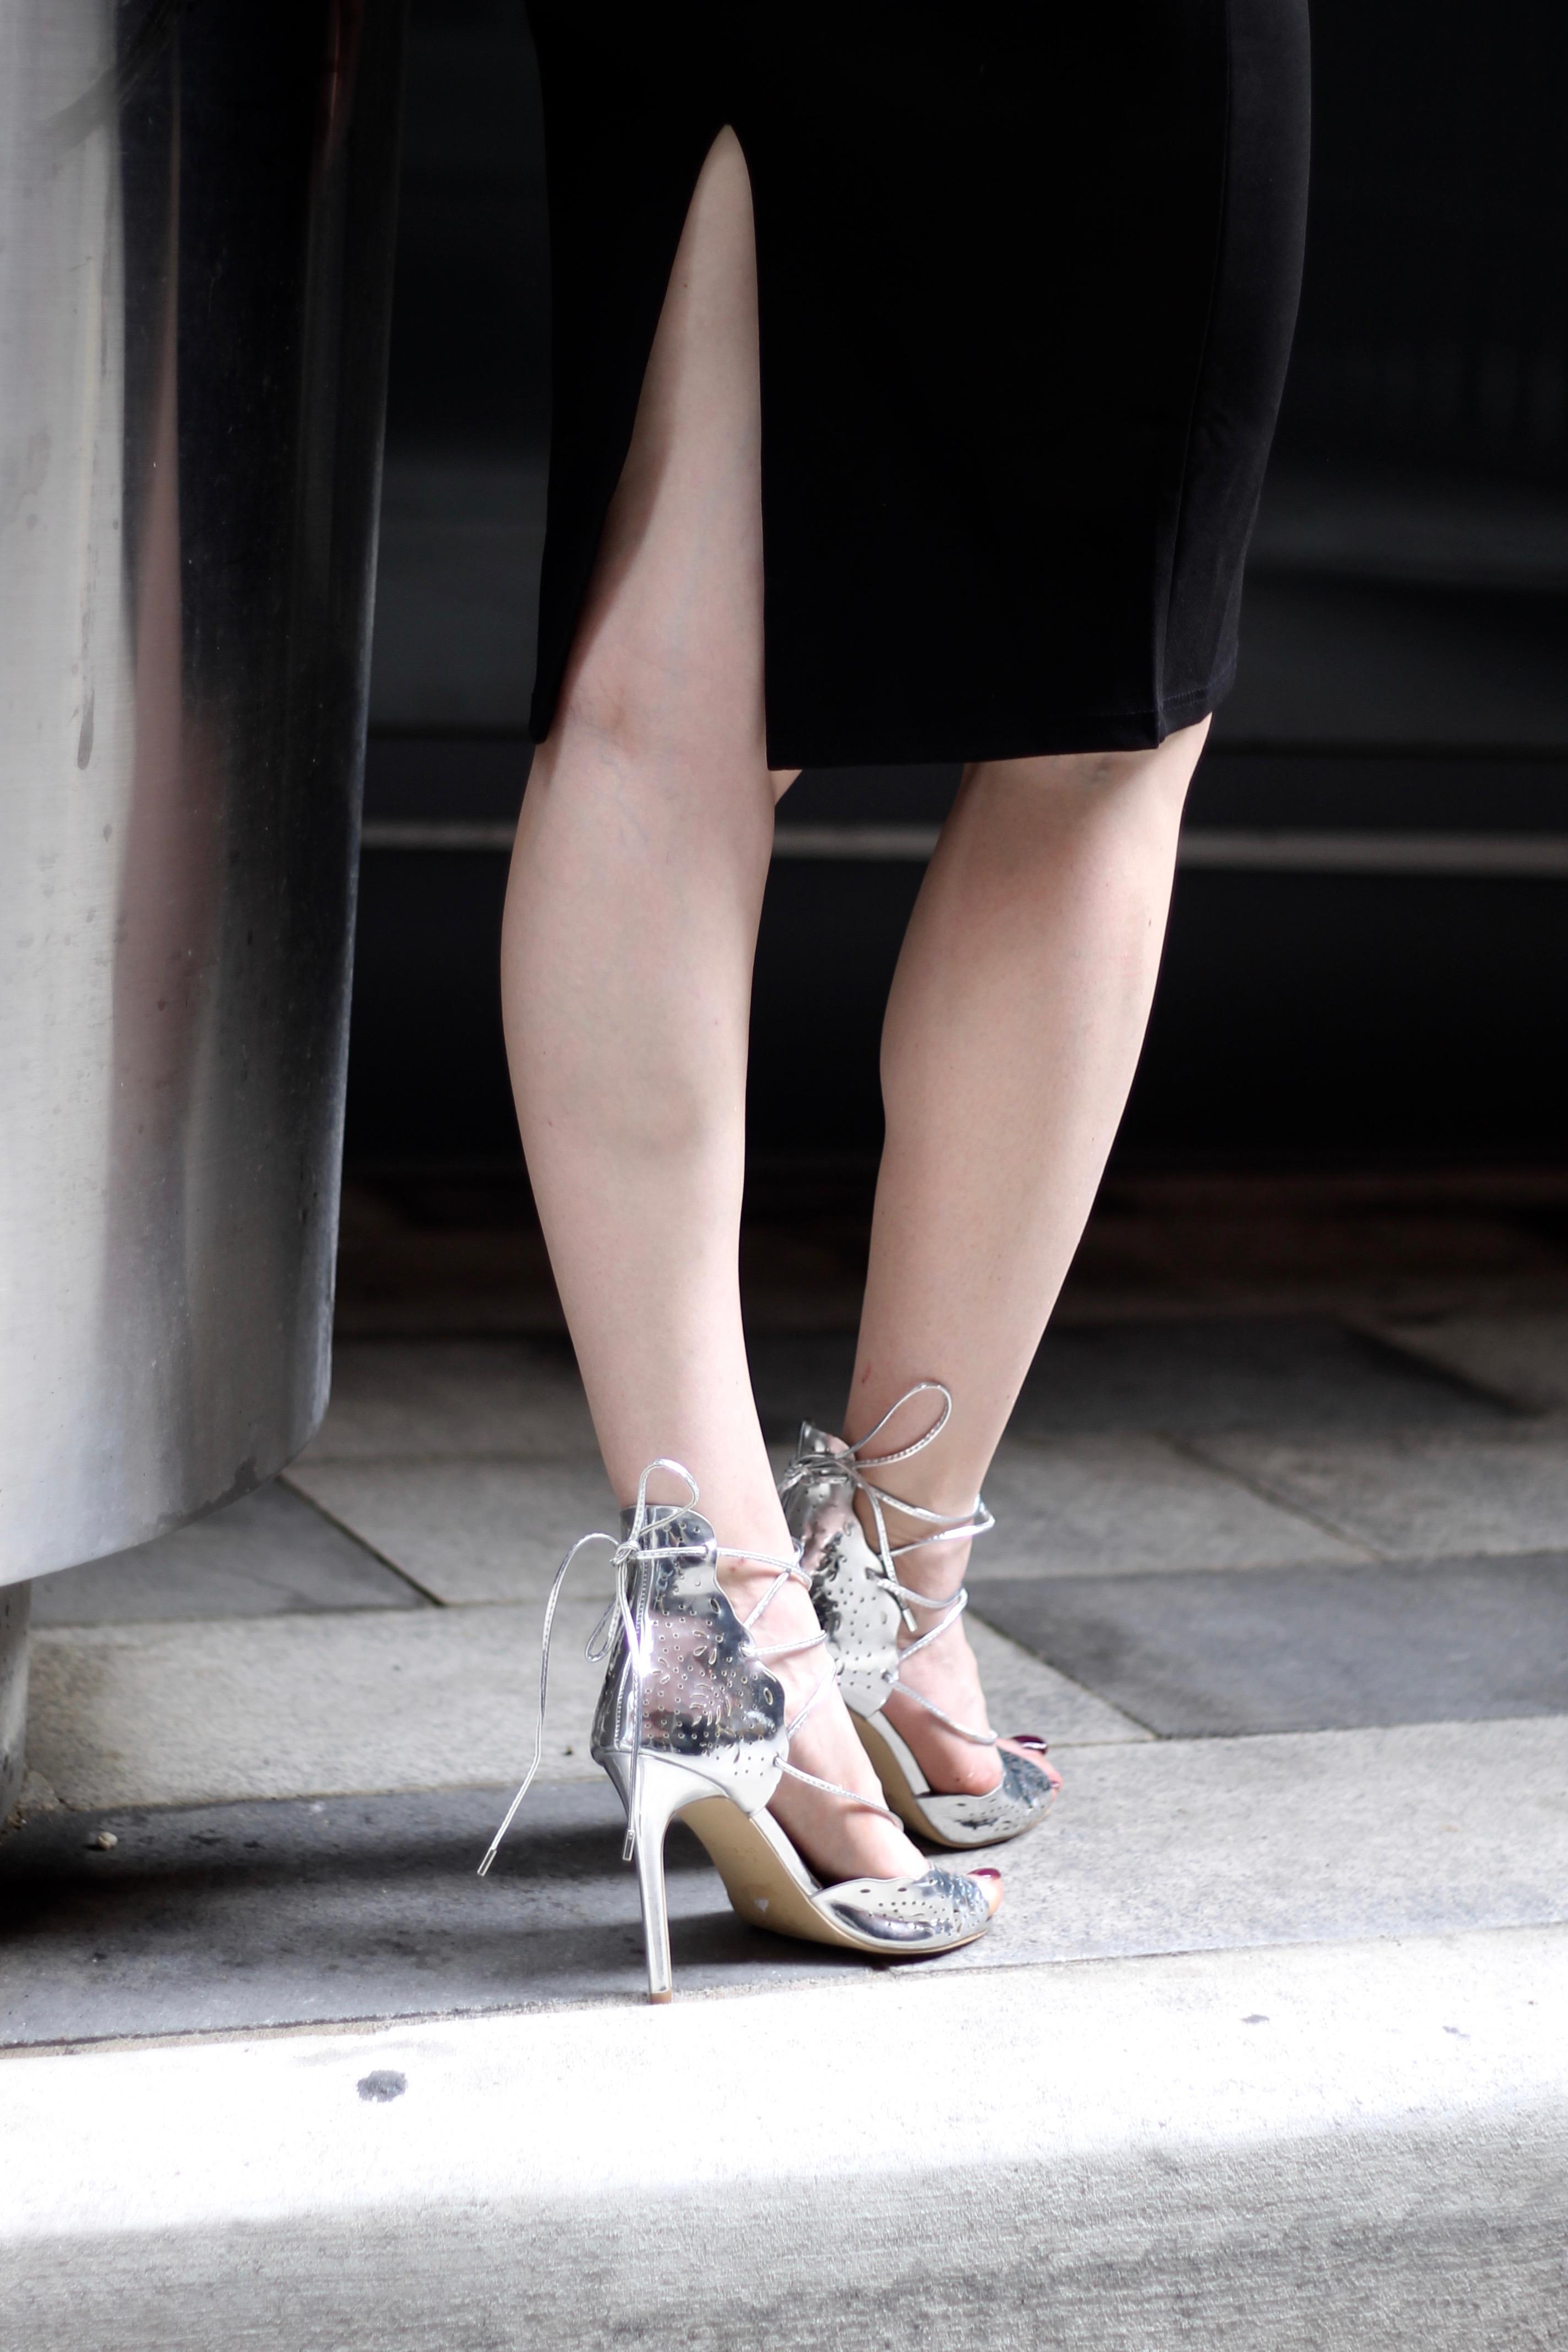 MON MODE Blog | Mon Mode | Style Blog | Toronto Blogger | Fashionbogger | personal style